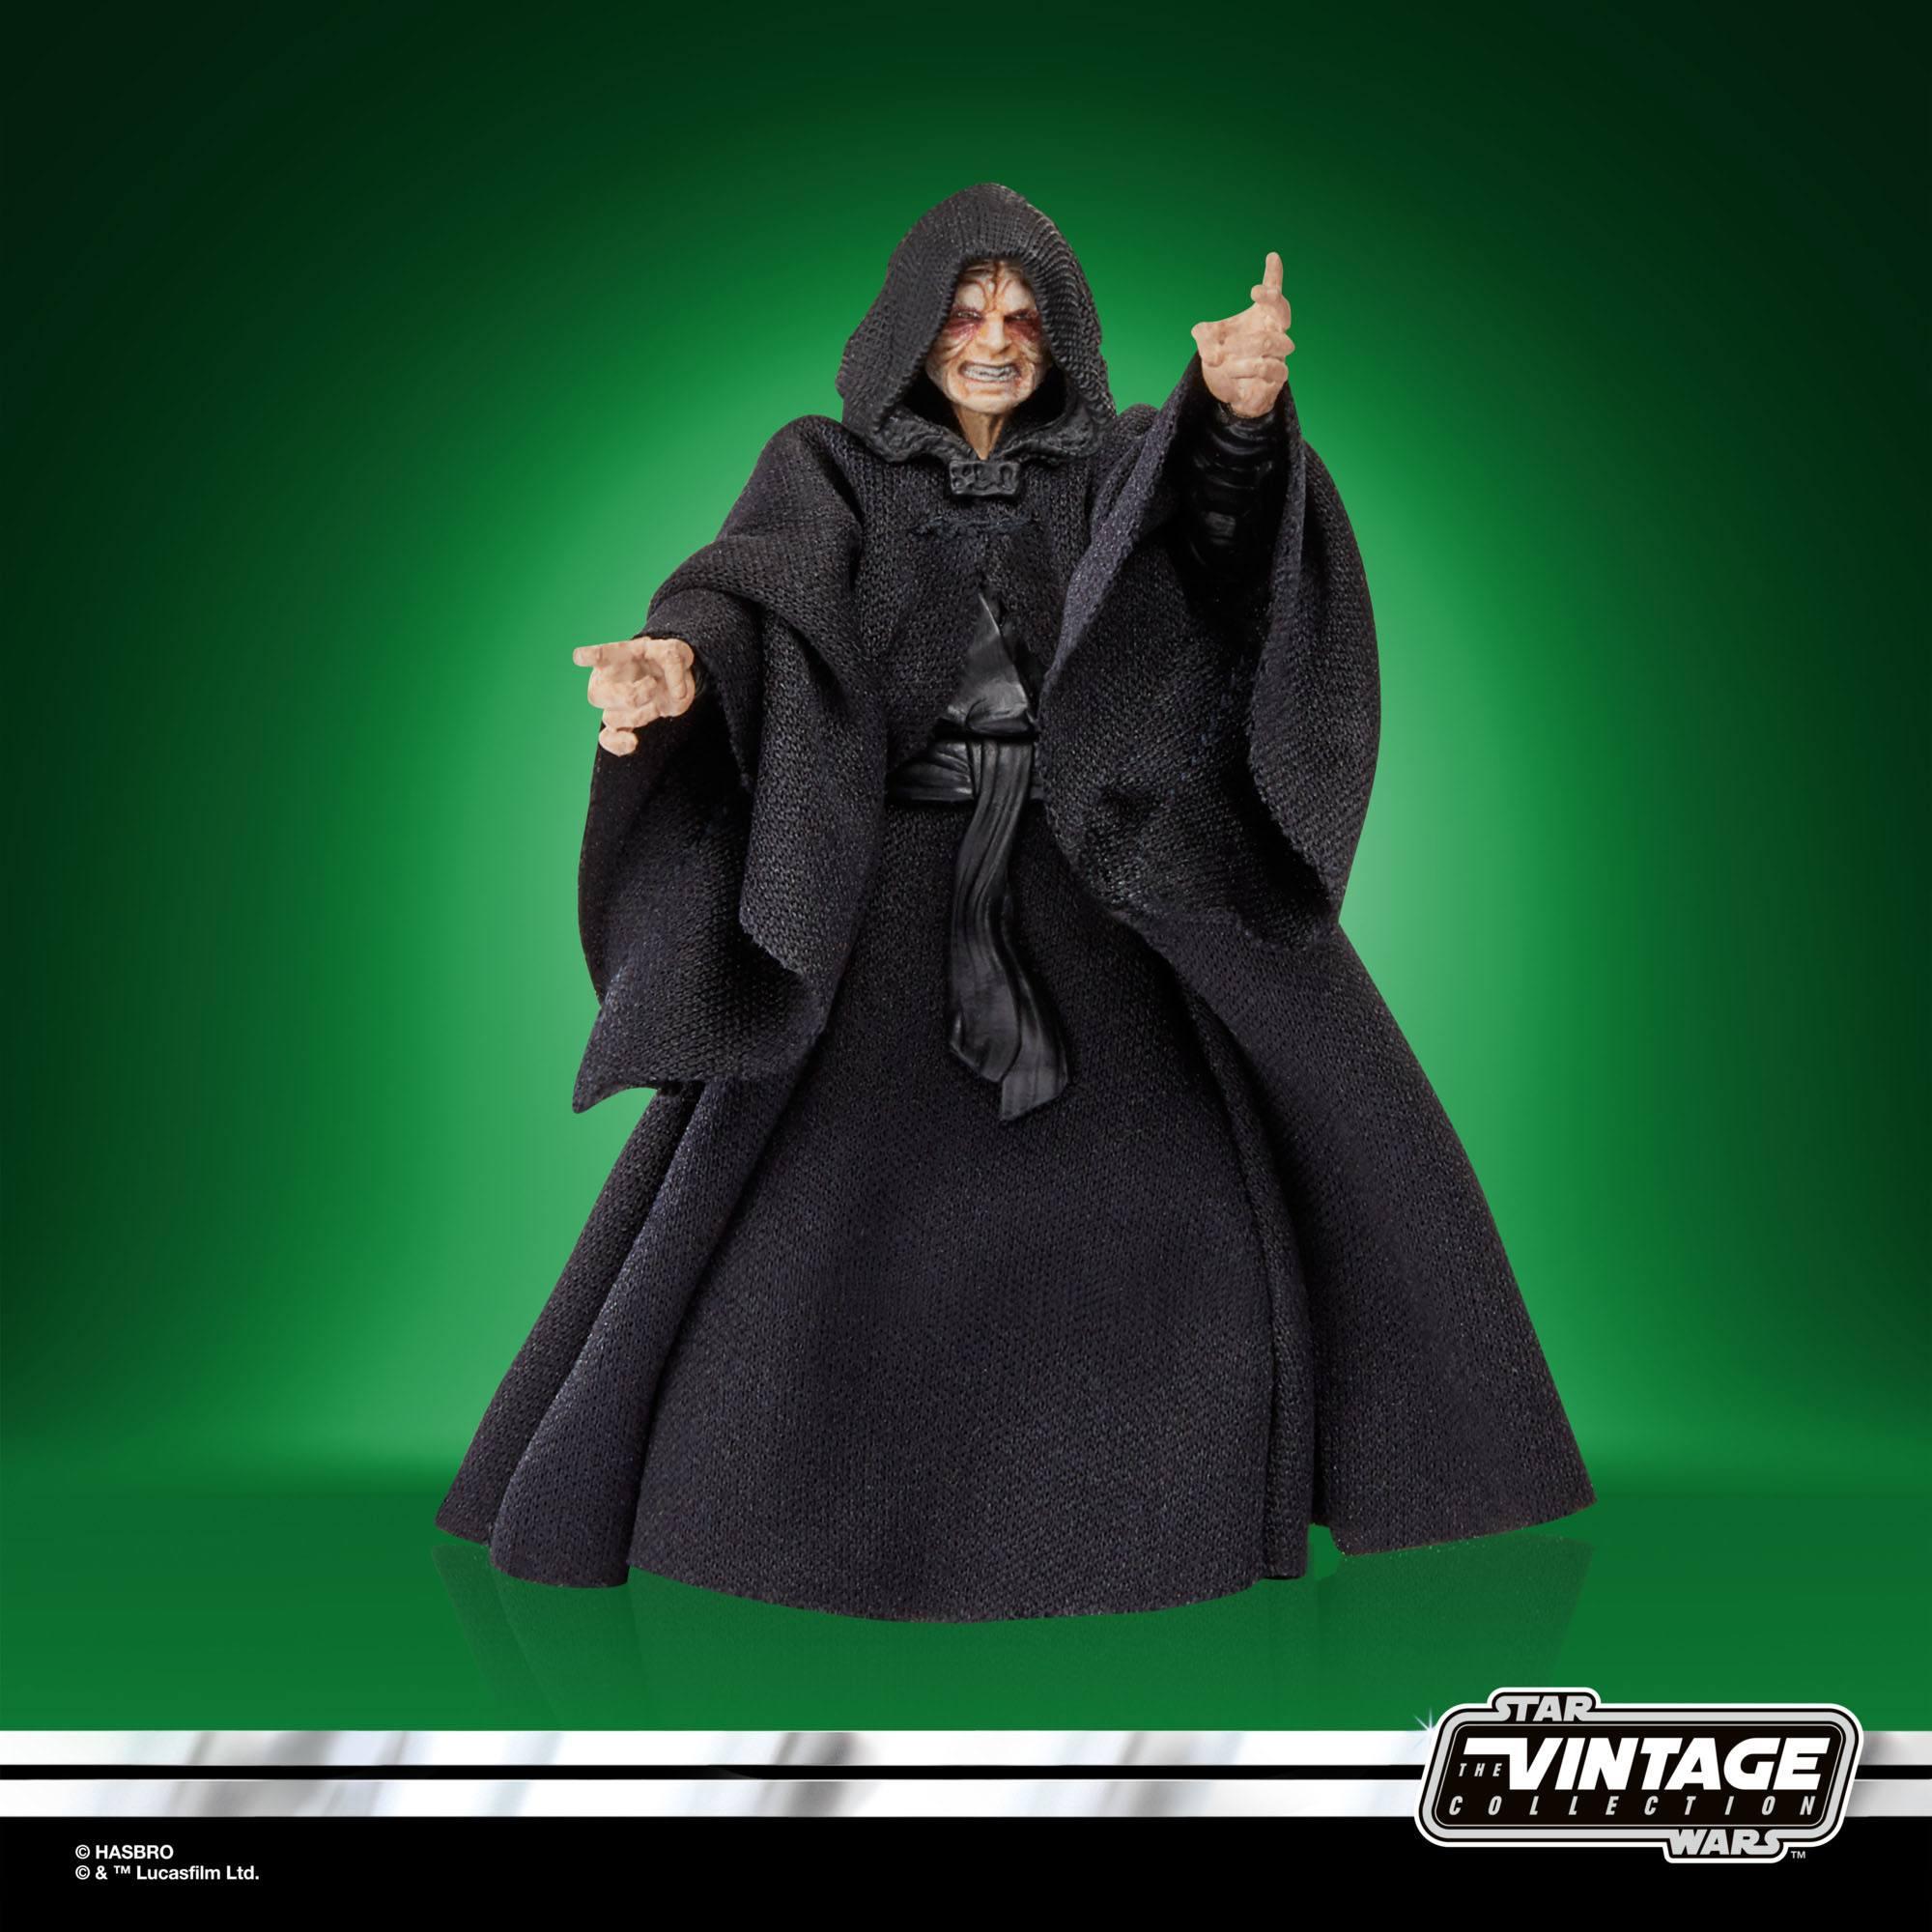 Star Wars Vintage Collection  The Emperor (Episode VI) F19025L00 5010993866335